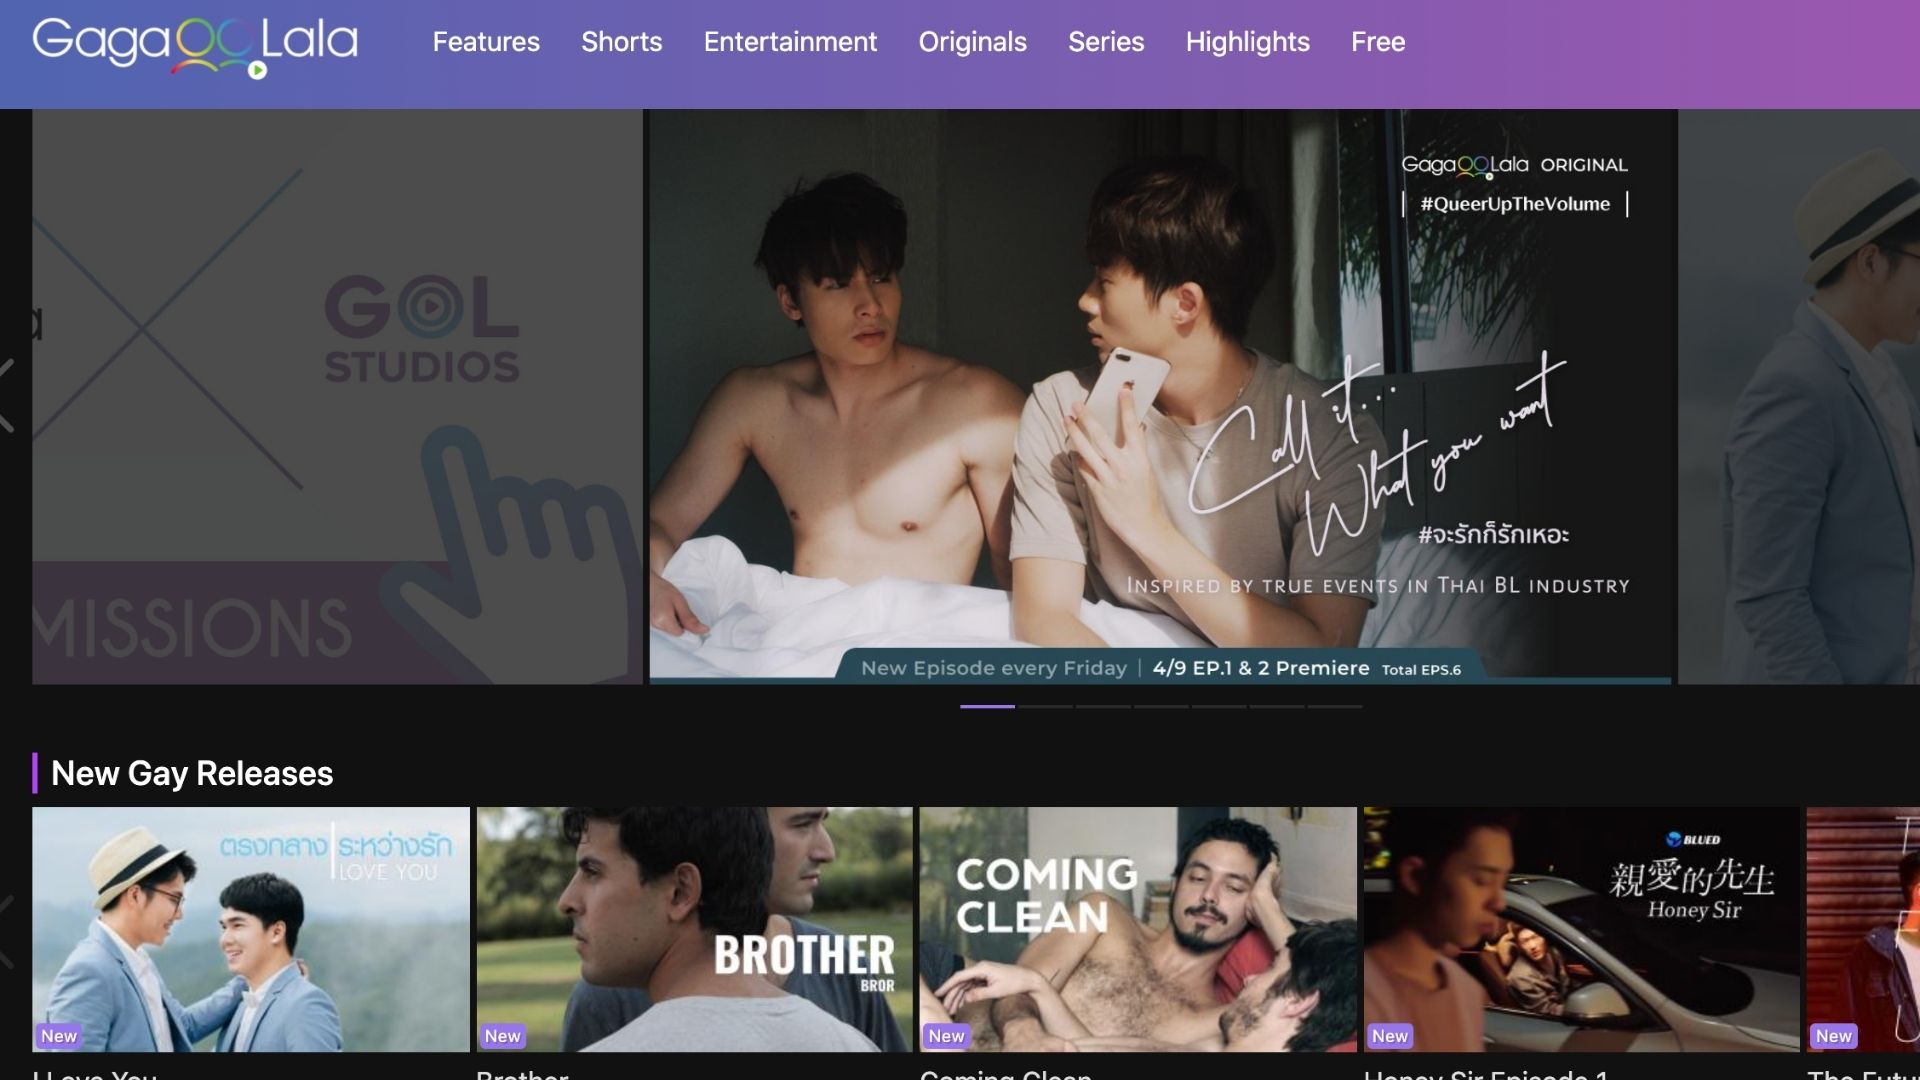 First LGBTQ streaming platform in Asia